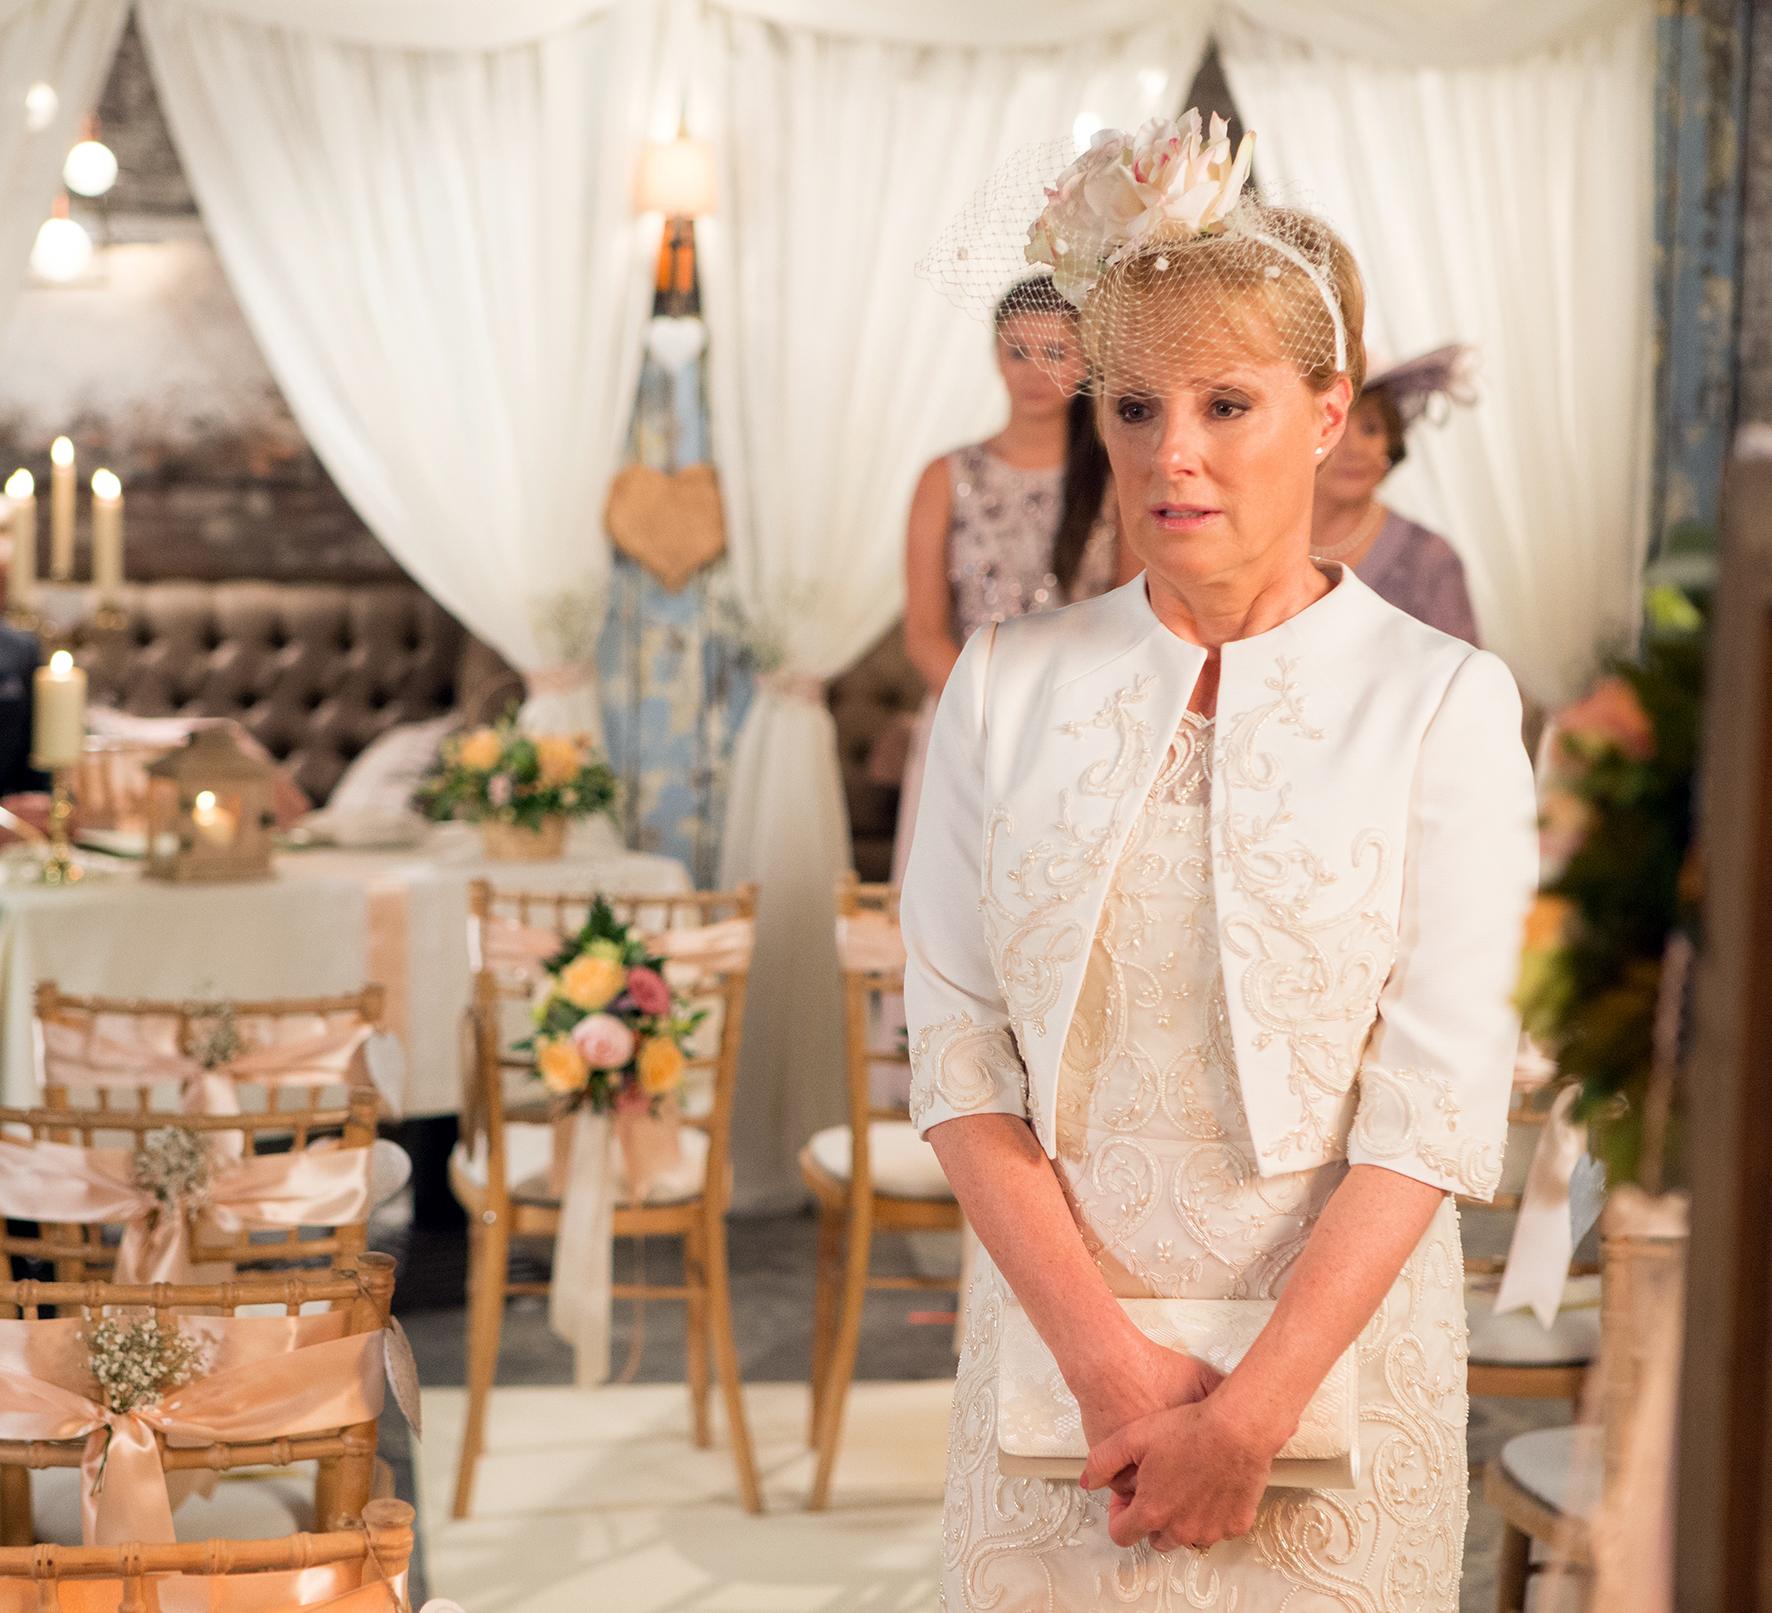 Wedding Left At The Altar: Soap Spoilers: Coronation Street Wedding, EastEnders